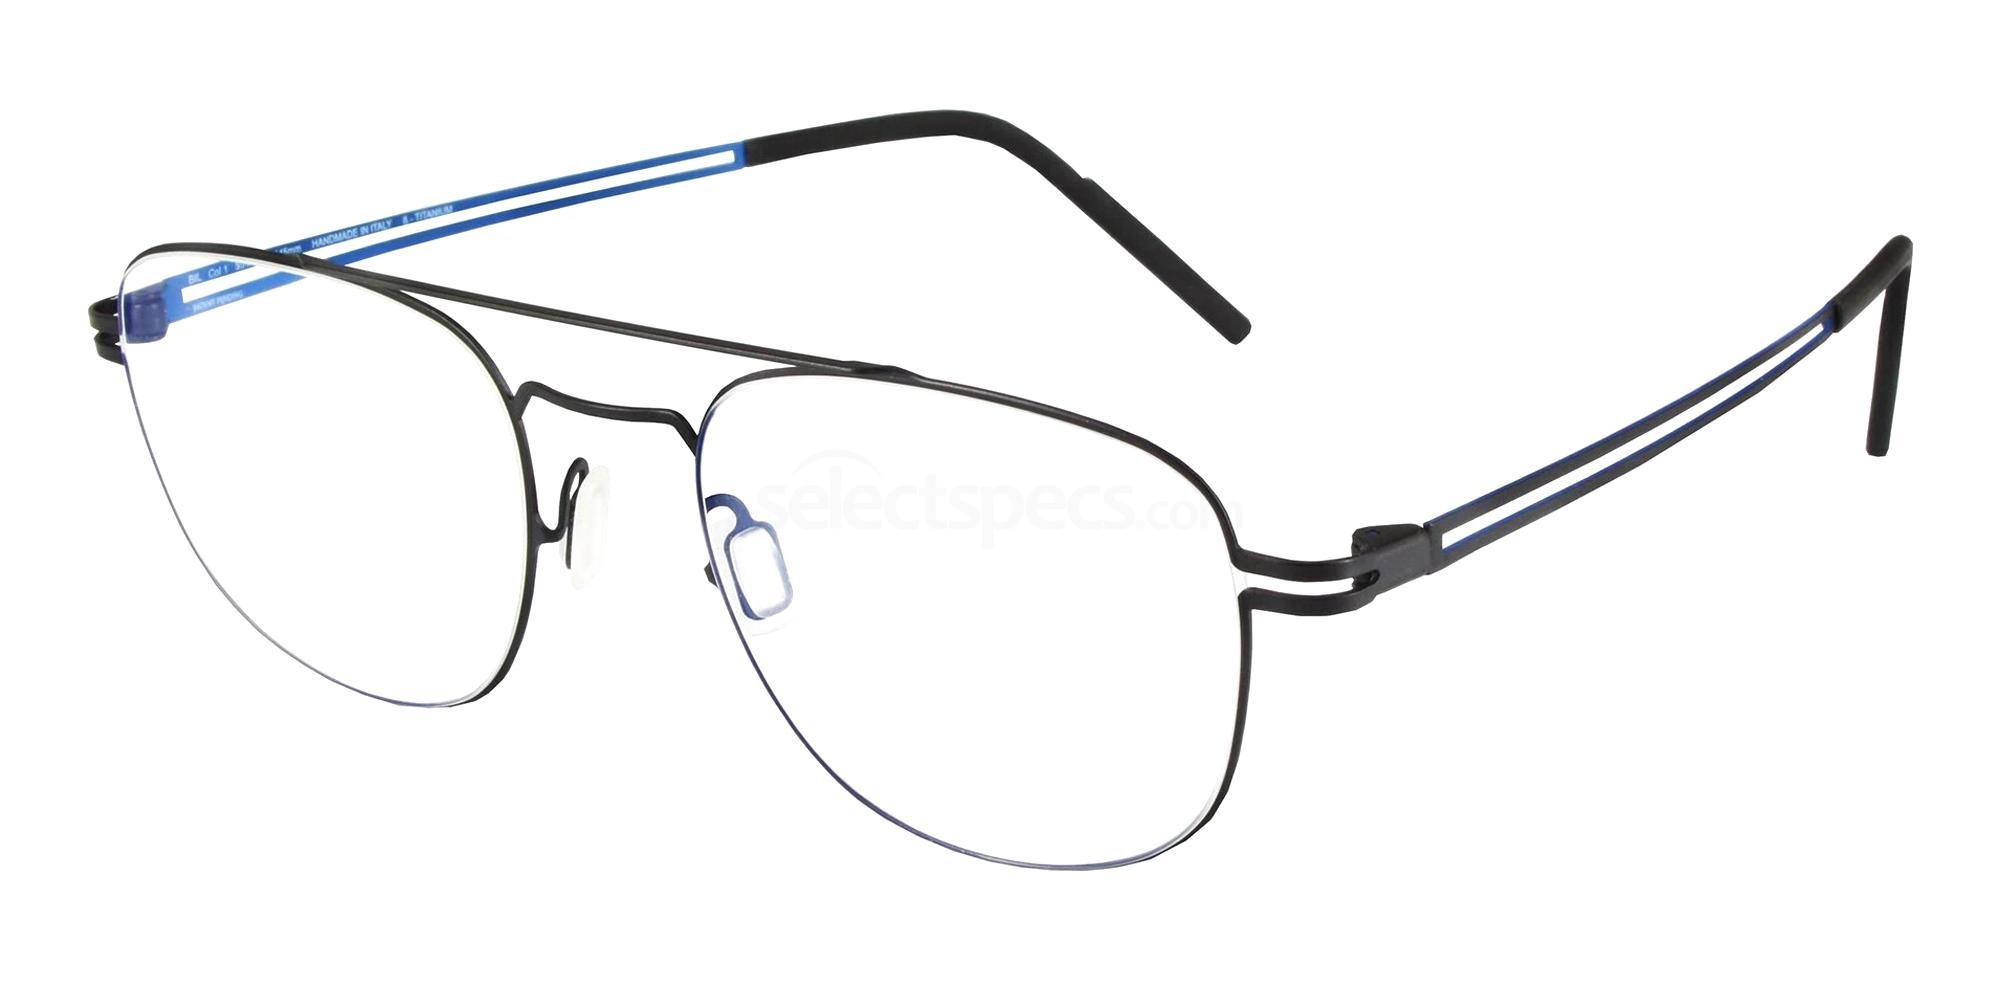 C1 BIL Glasses, Reykjavik Eyes Black Label